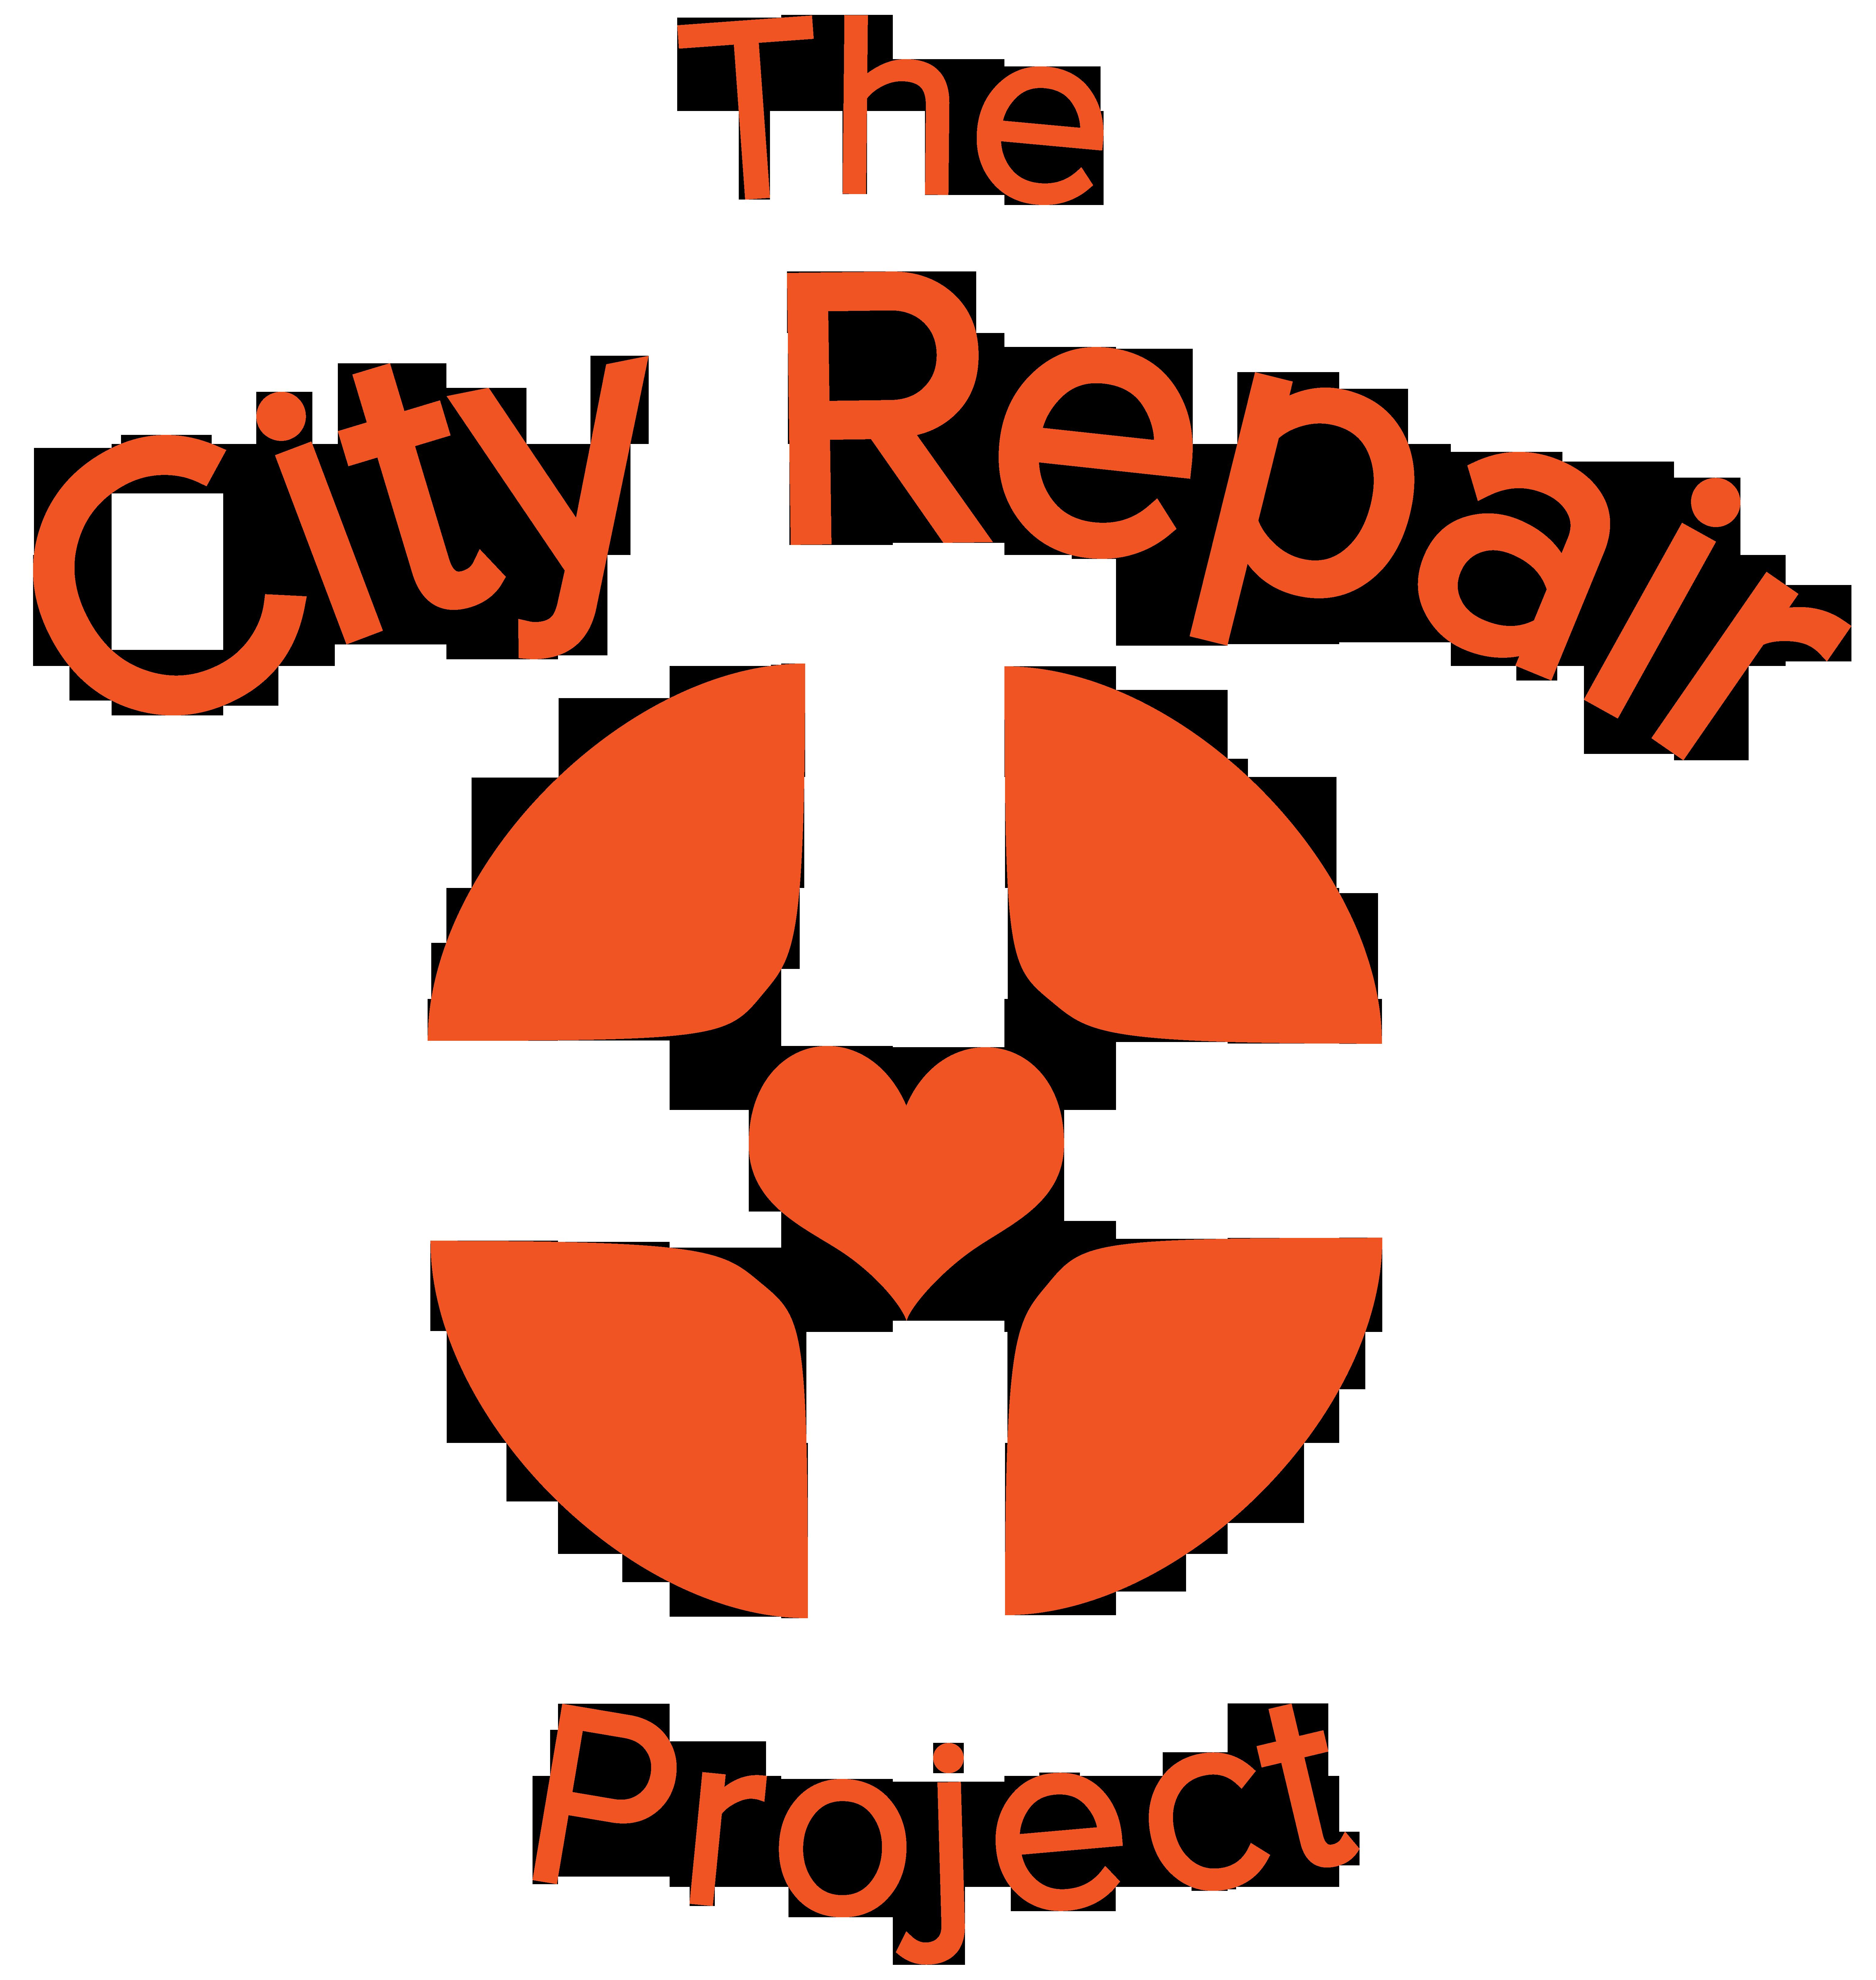 City Repair Project